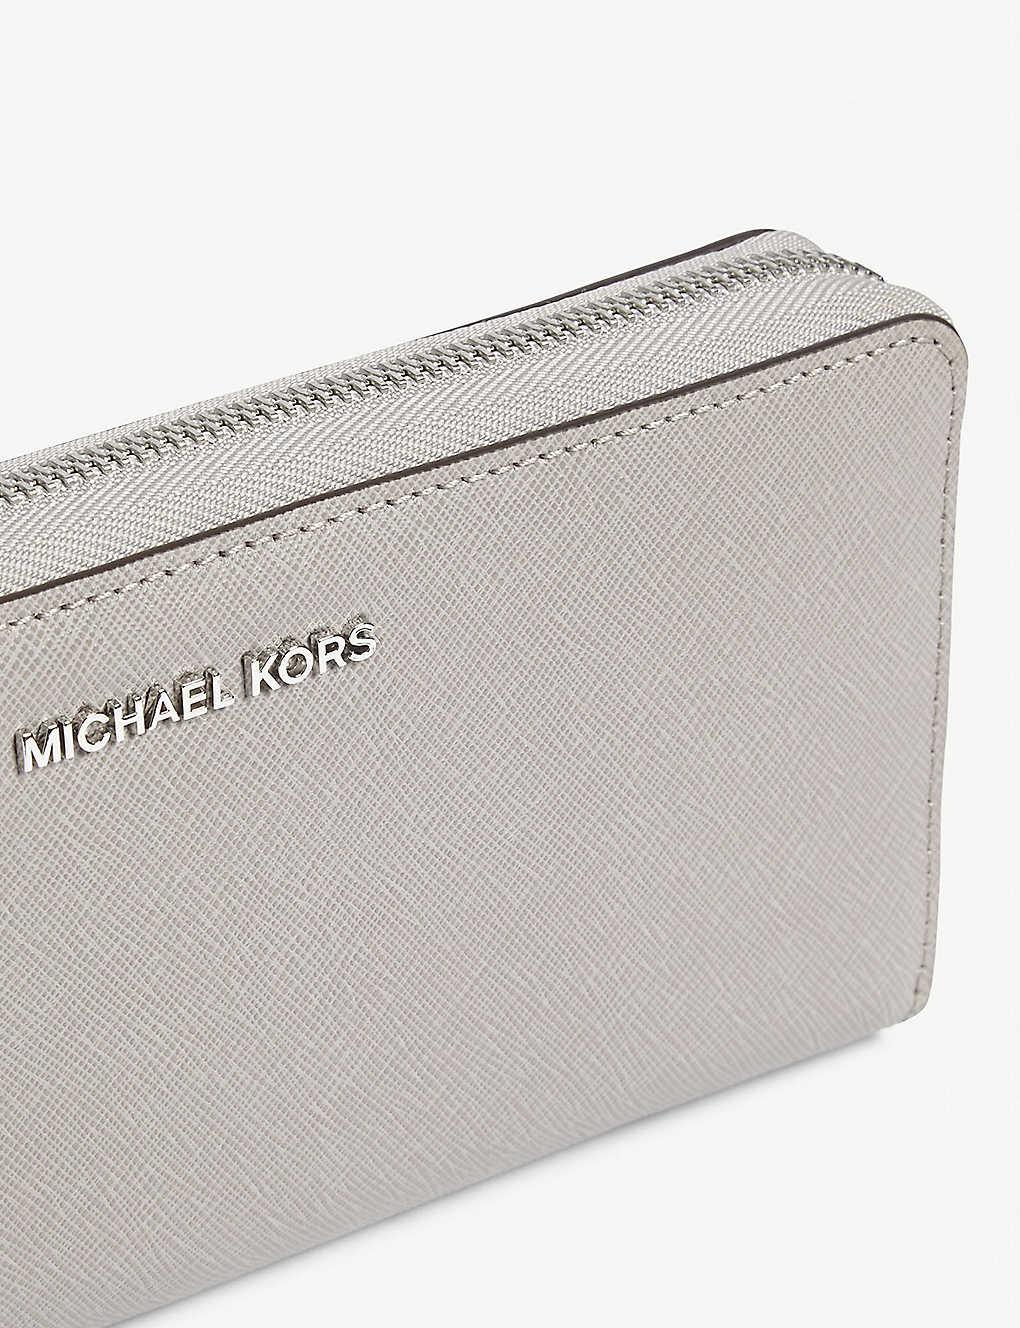 1f187a6dc1b96c MICHAEL MICHAEL KORS - Jet Set Travel leather continental wallet ...